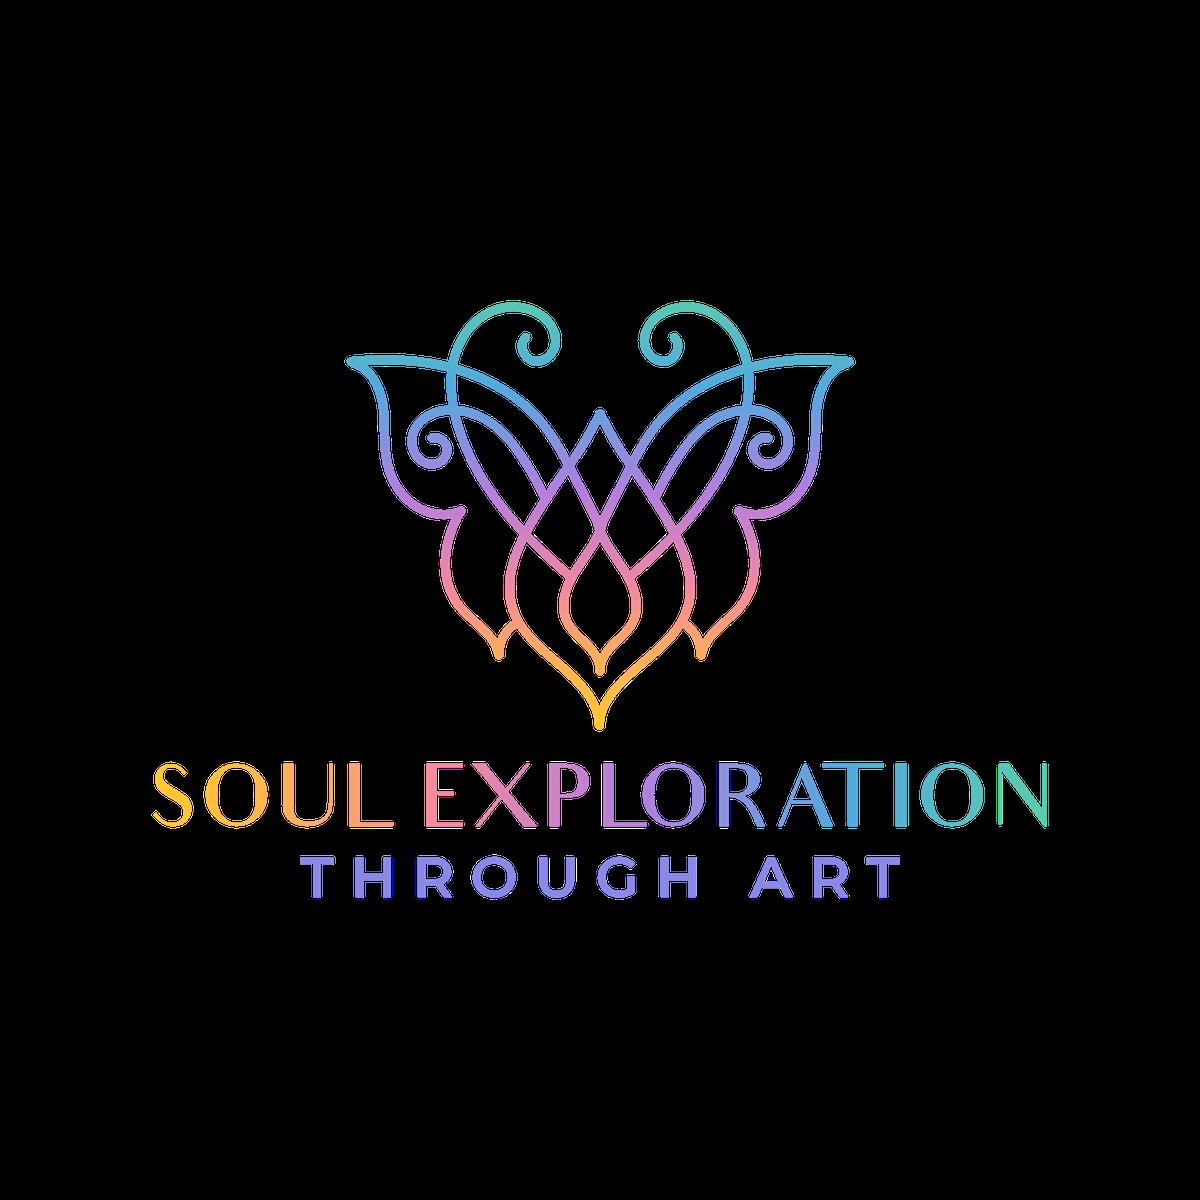 Soul Exploration Through Art logo